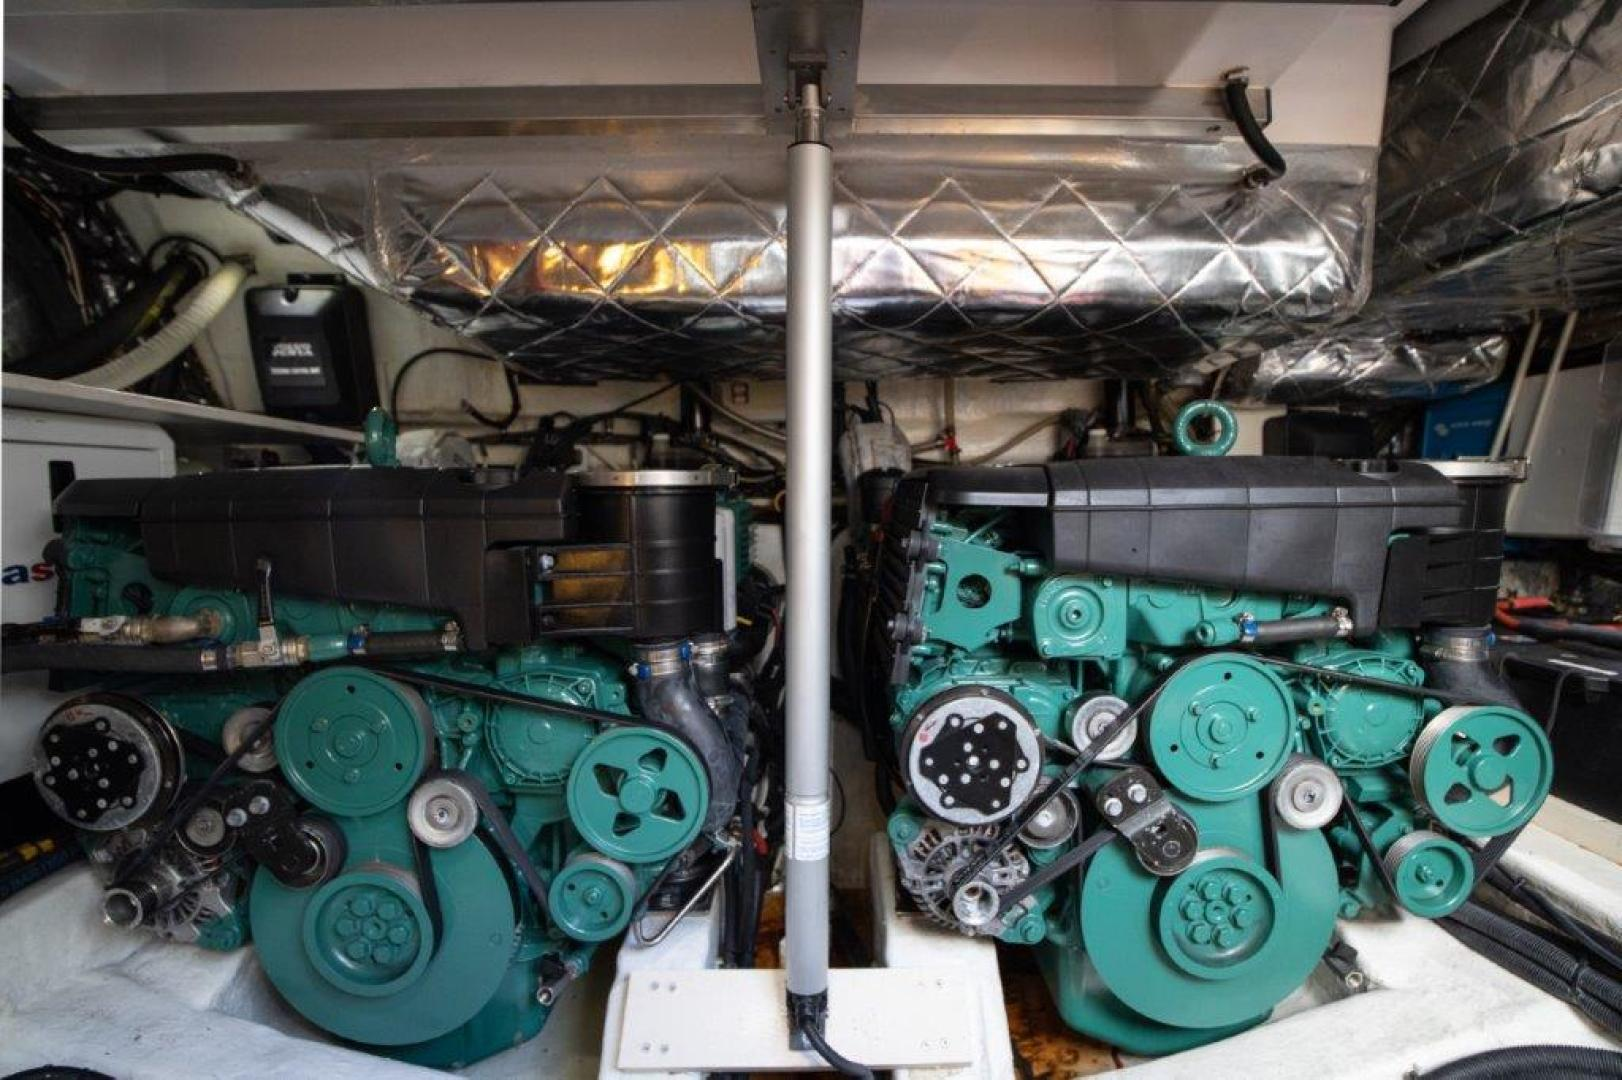 Invictus-370 GT 2018-EOS II Fort Lauderdale-Florida-United States-Engine Room-1624950 | Thumbnail